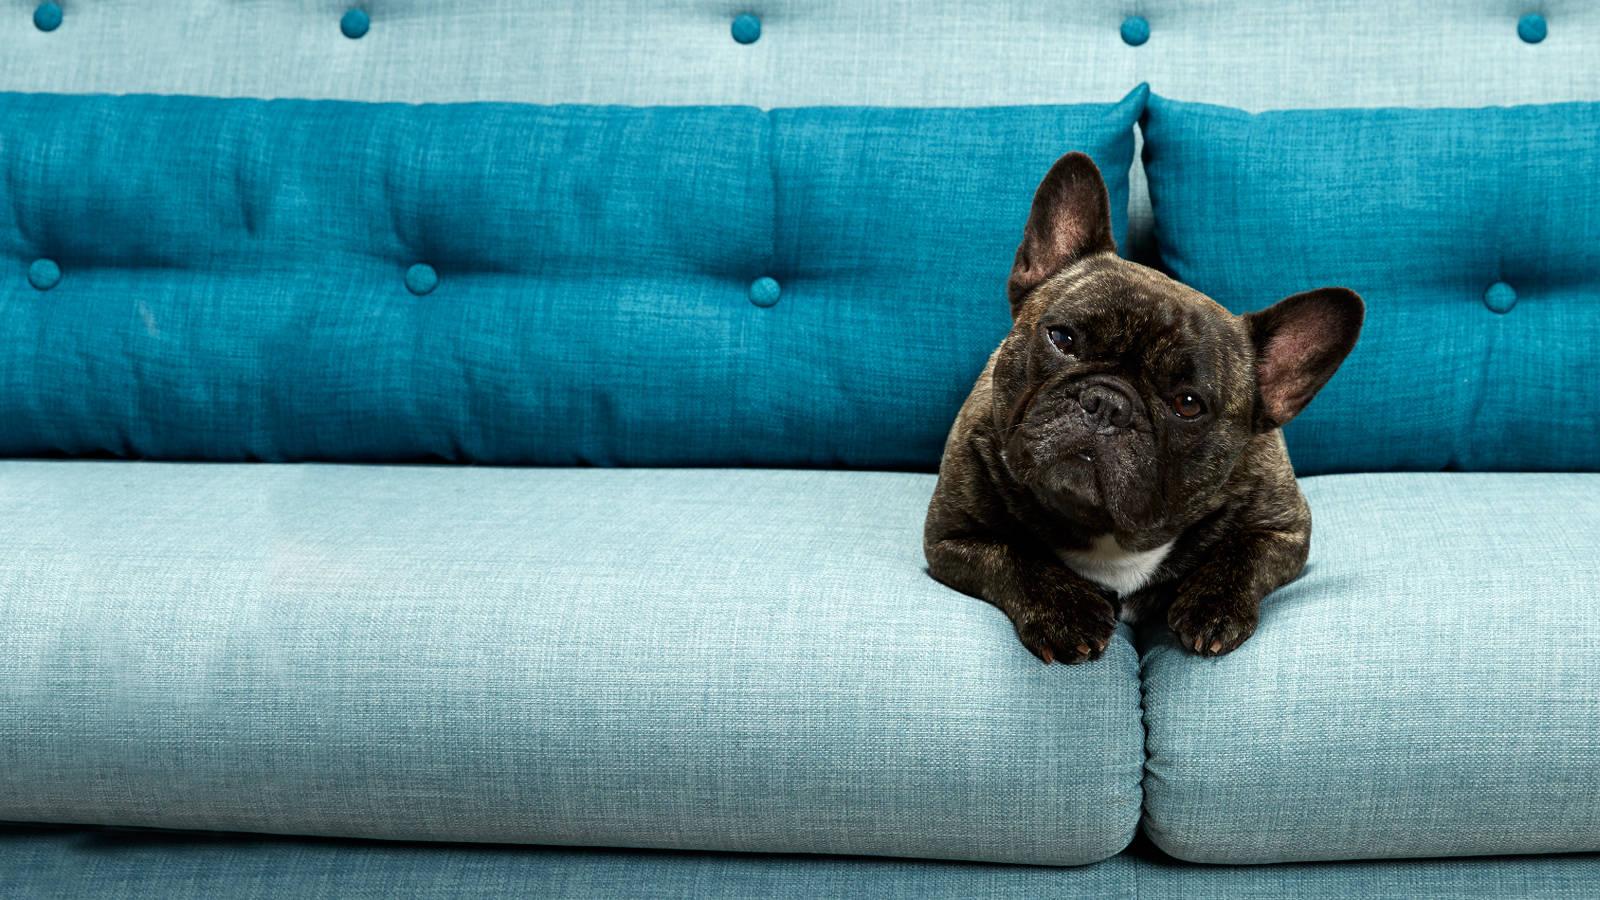 Dog sat on a light fabric sofa